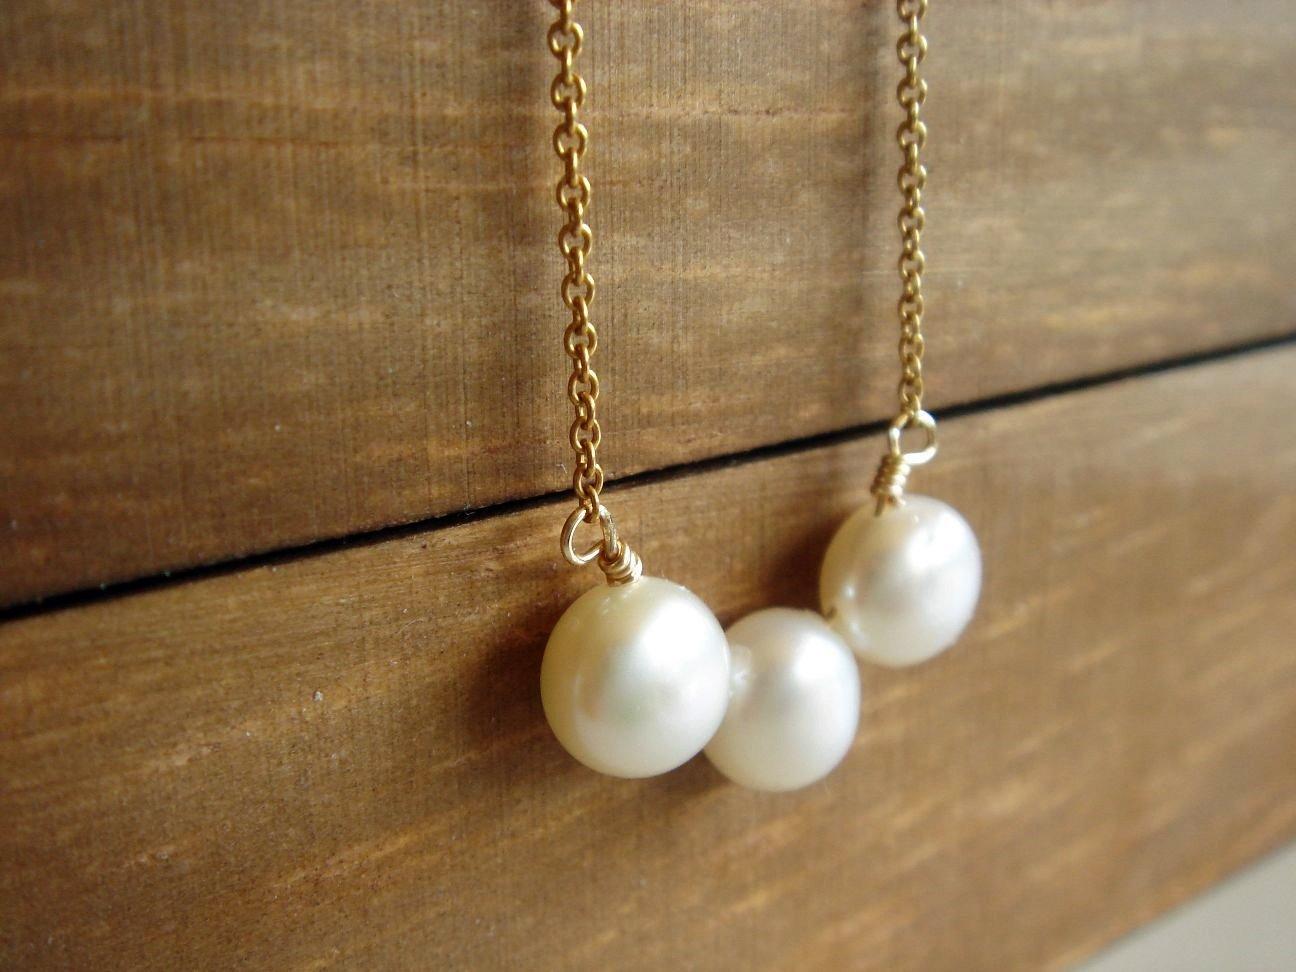 Sensitive Skin Necklace - 14k Gold Filled Freshwater Pearl Gift